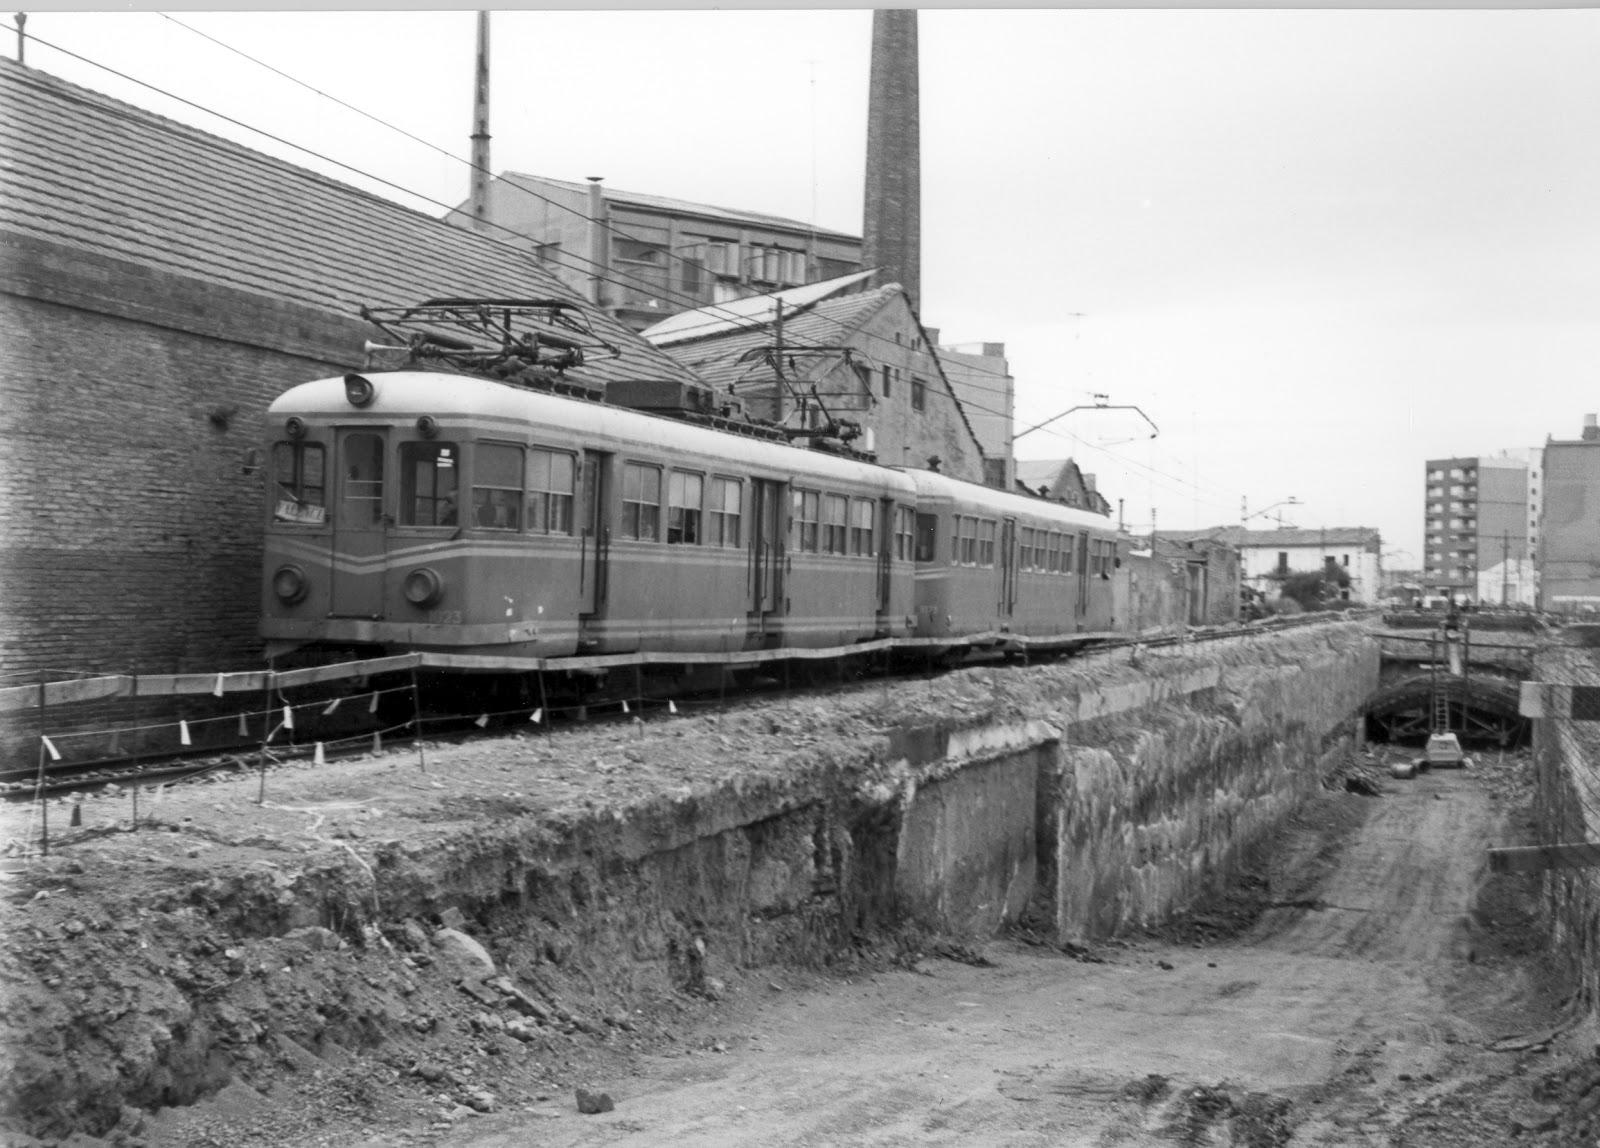 Historias del tren el trenet de la ribera - Material de construccion en valencia ...